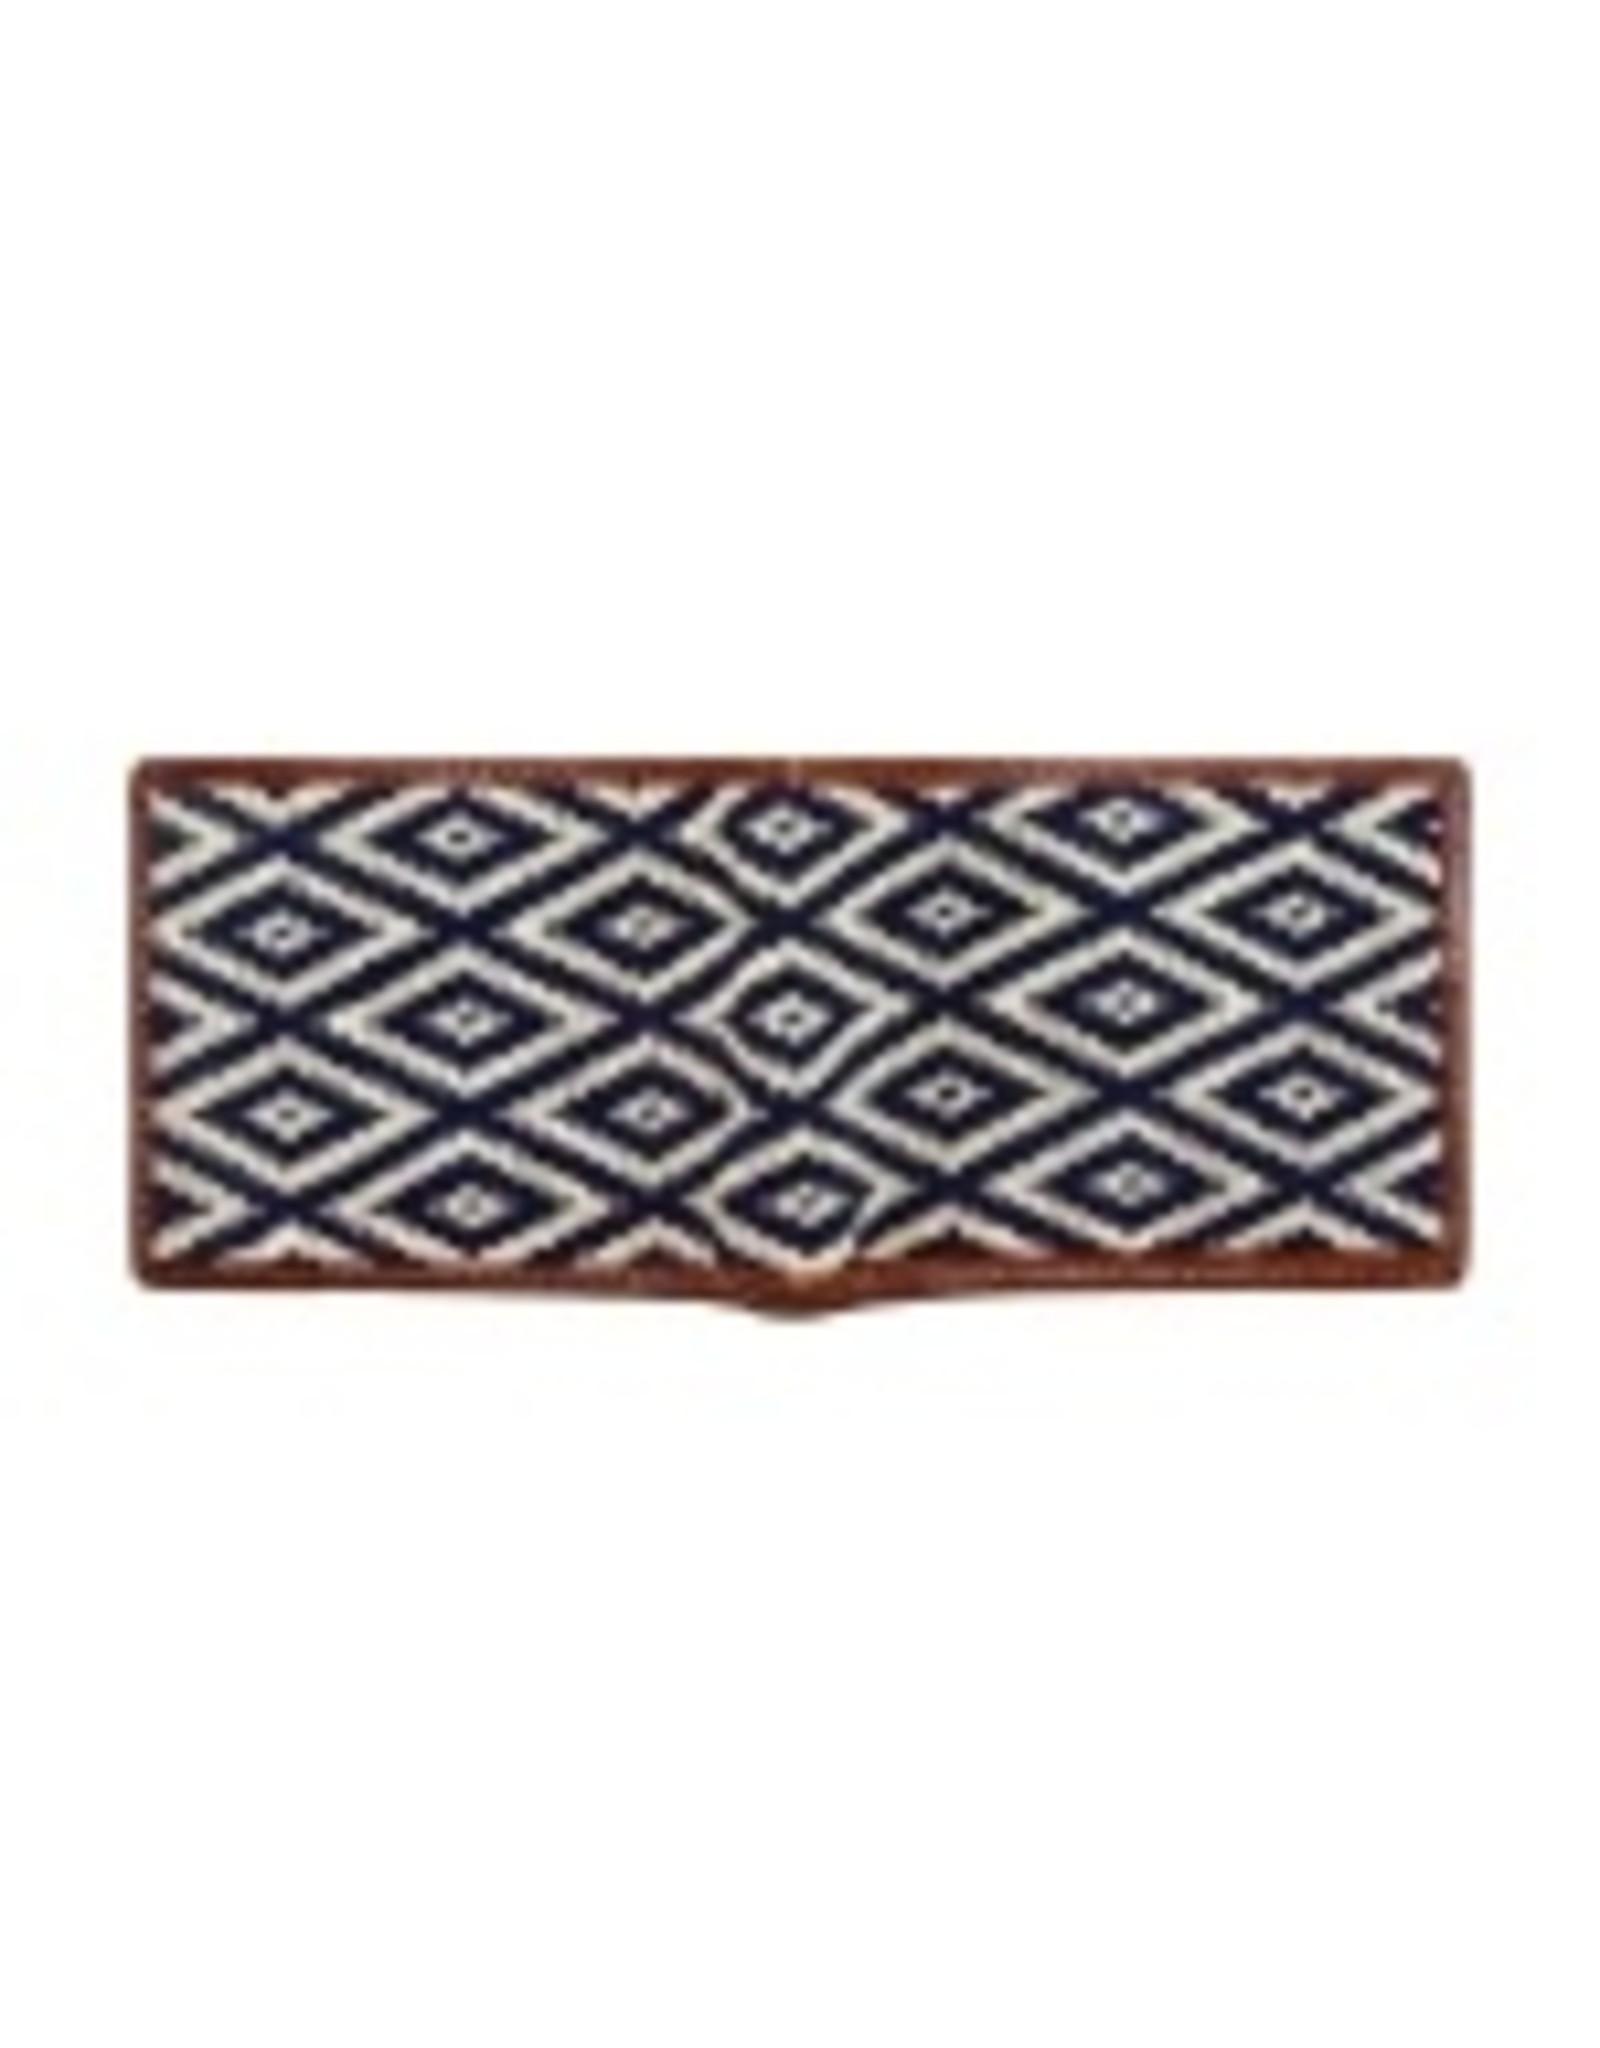 Smathers & Branson S&B Needlepoint Bi-fold Wallet, Gaucho Mini